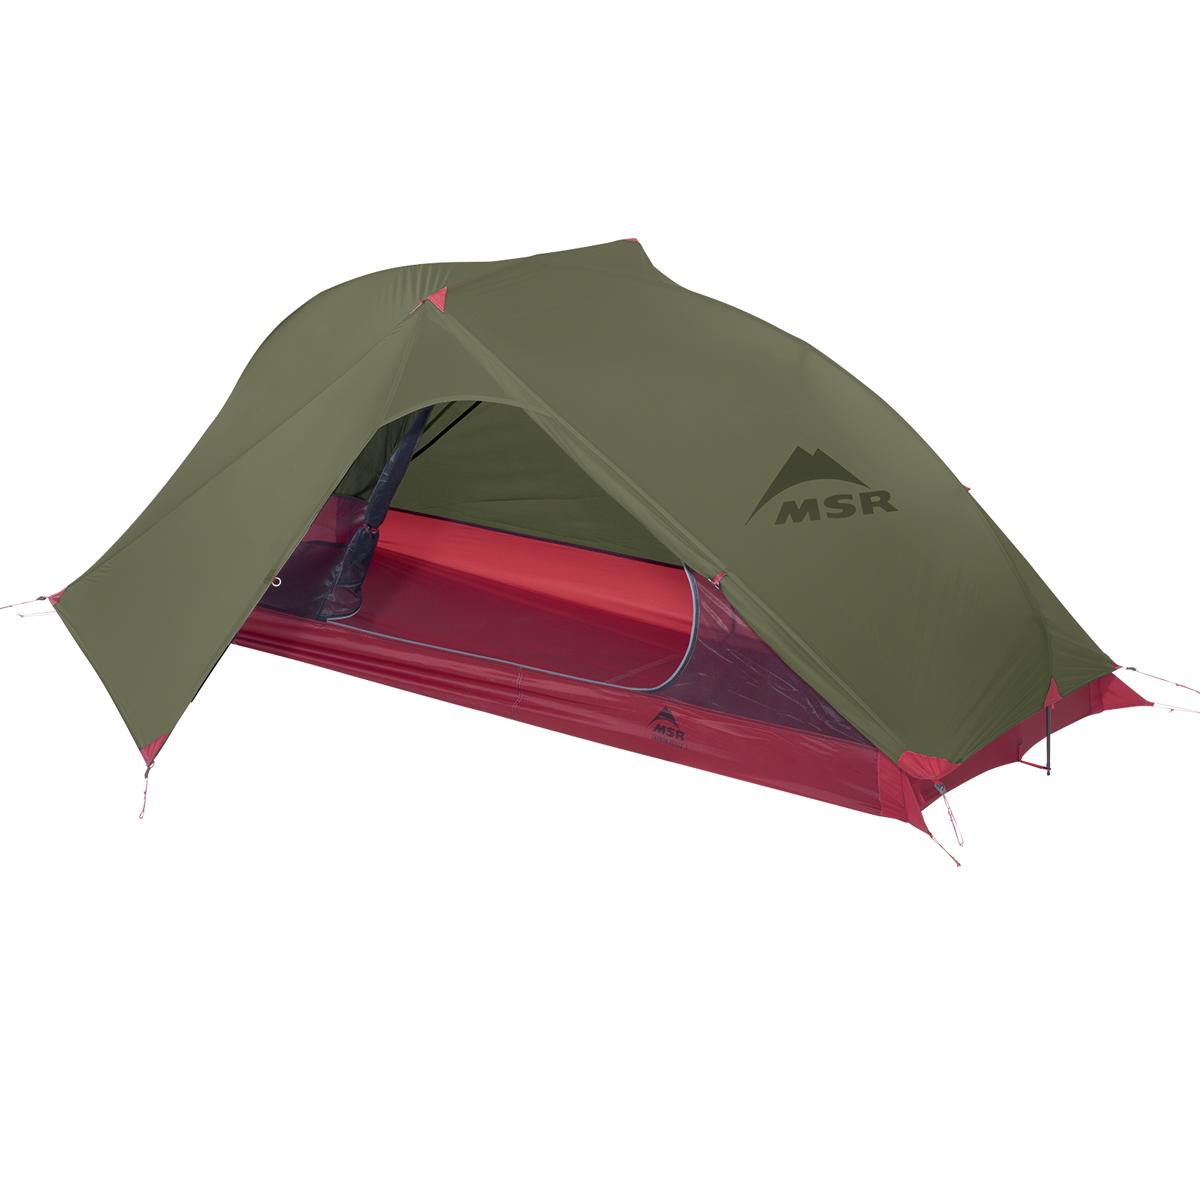 MSR Carbon Reflex 1 - 1 Persoons Tent - Groen